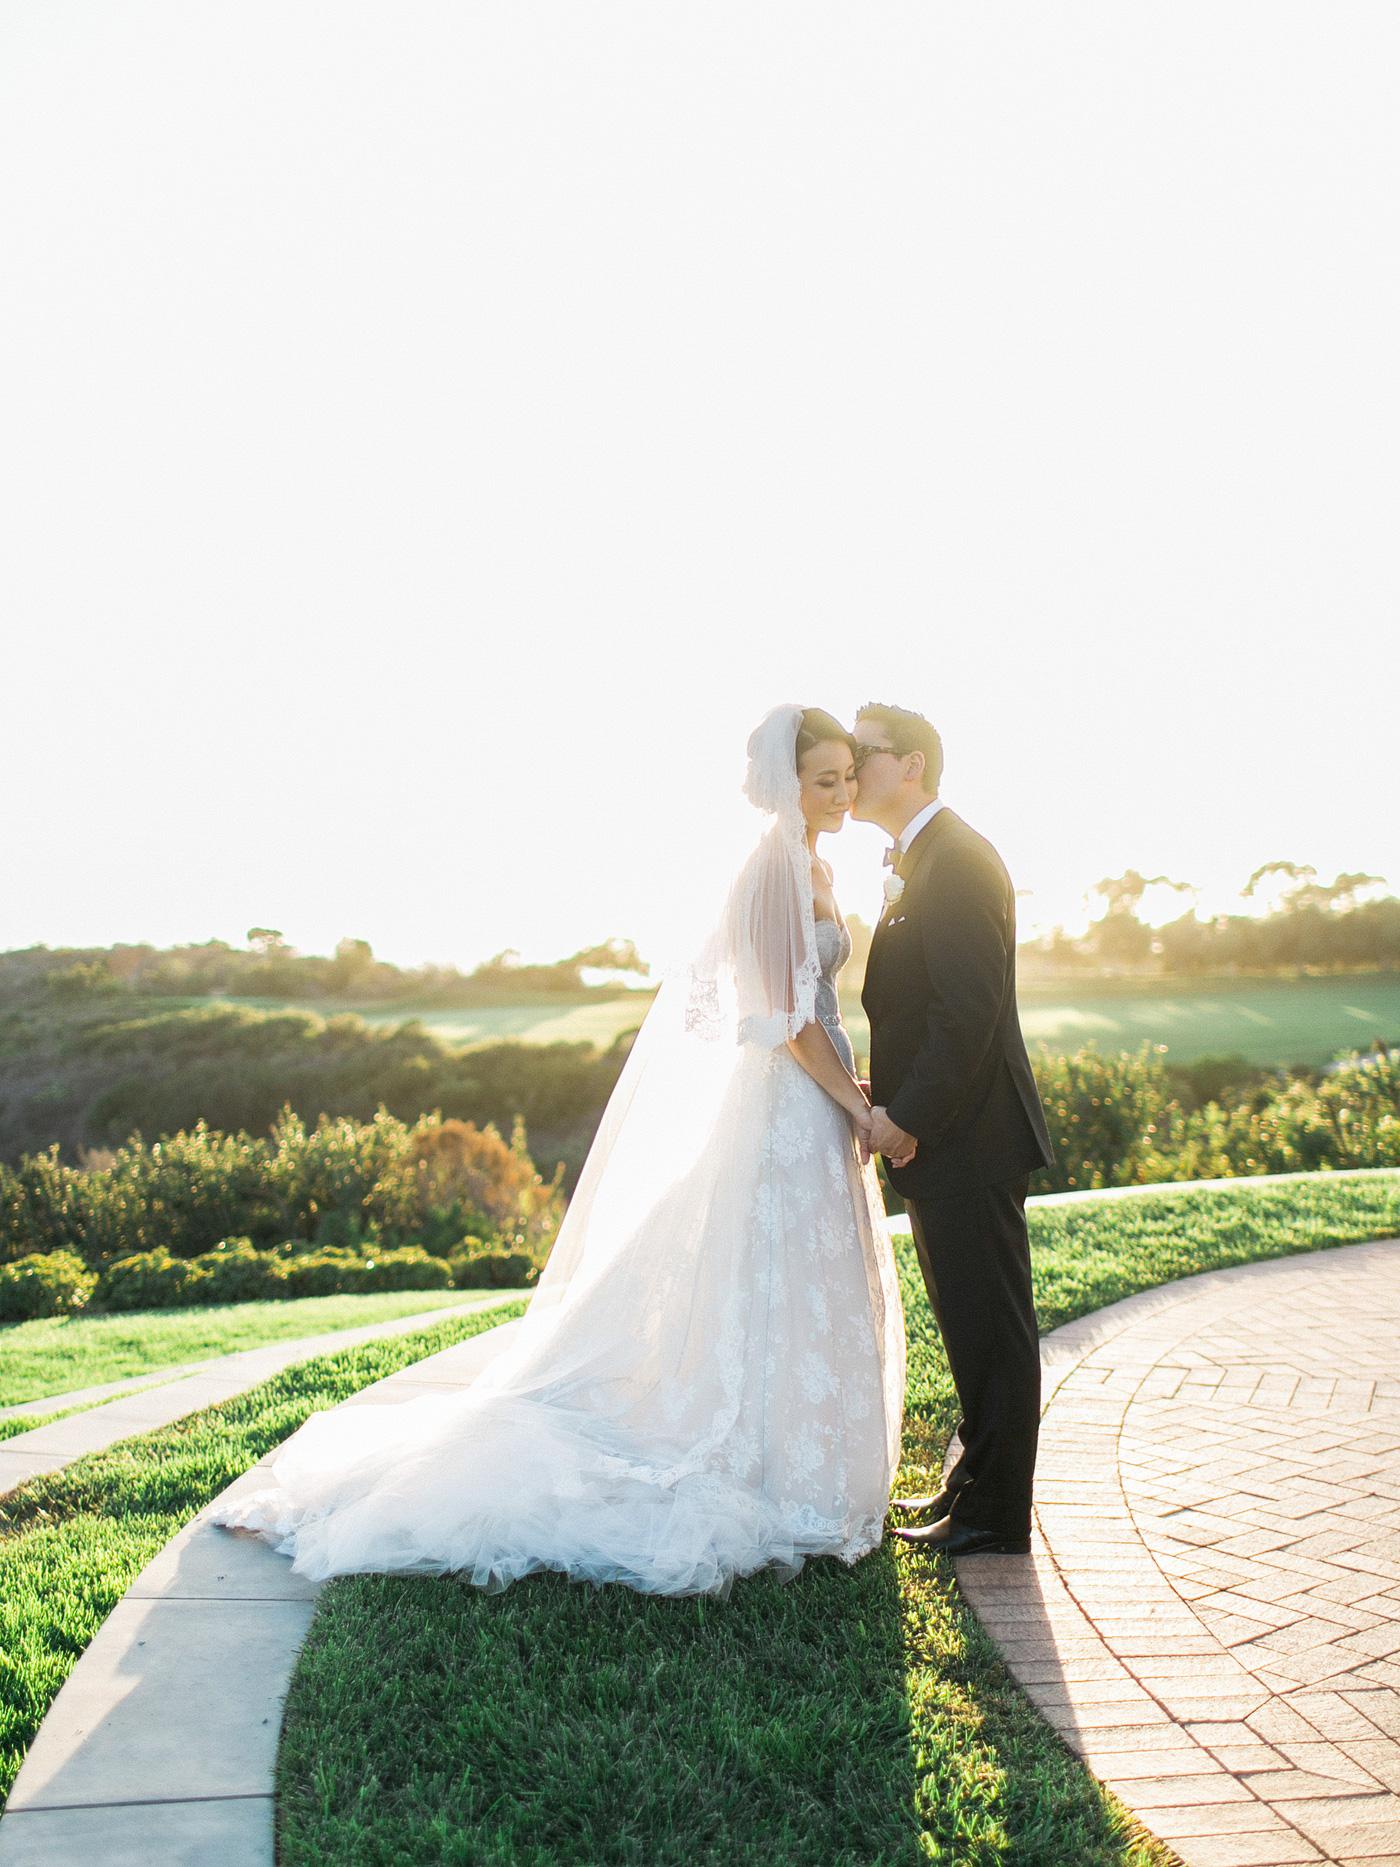 Pelican-hill-wedding-29